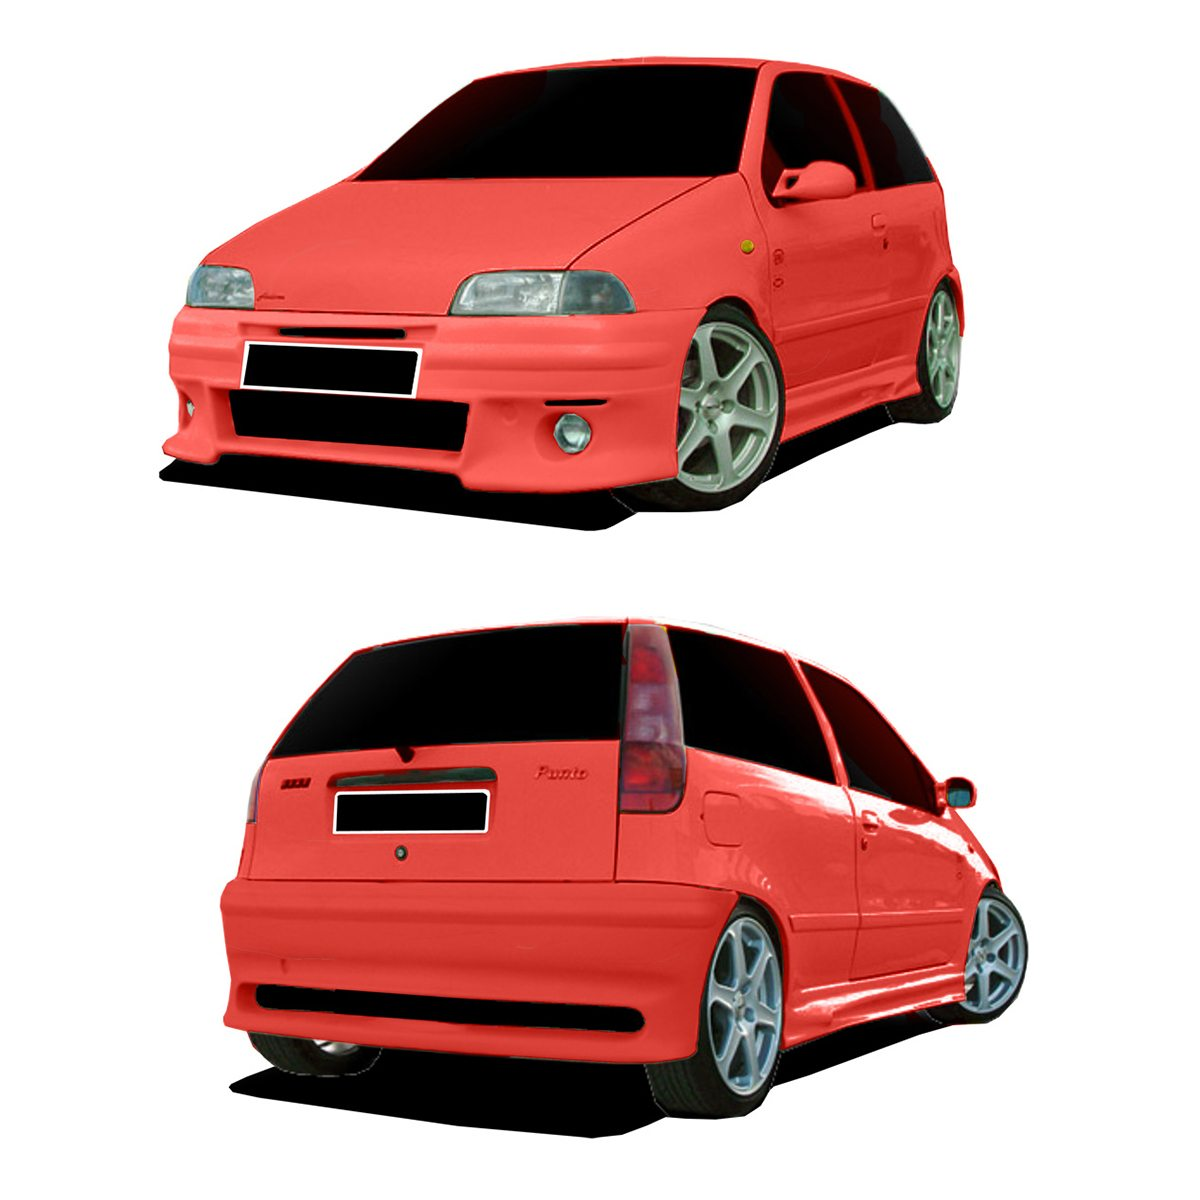 Fiat-Punto-Spyder-KIT-QTU212